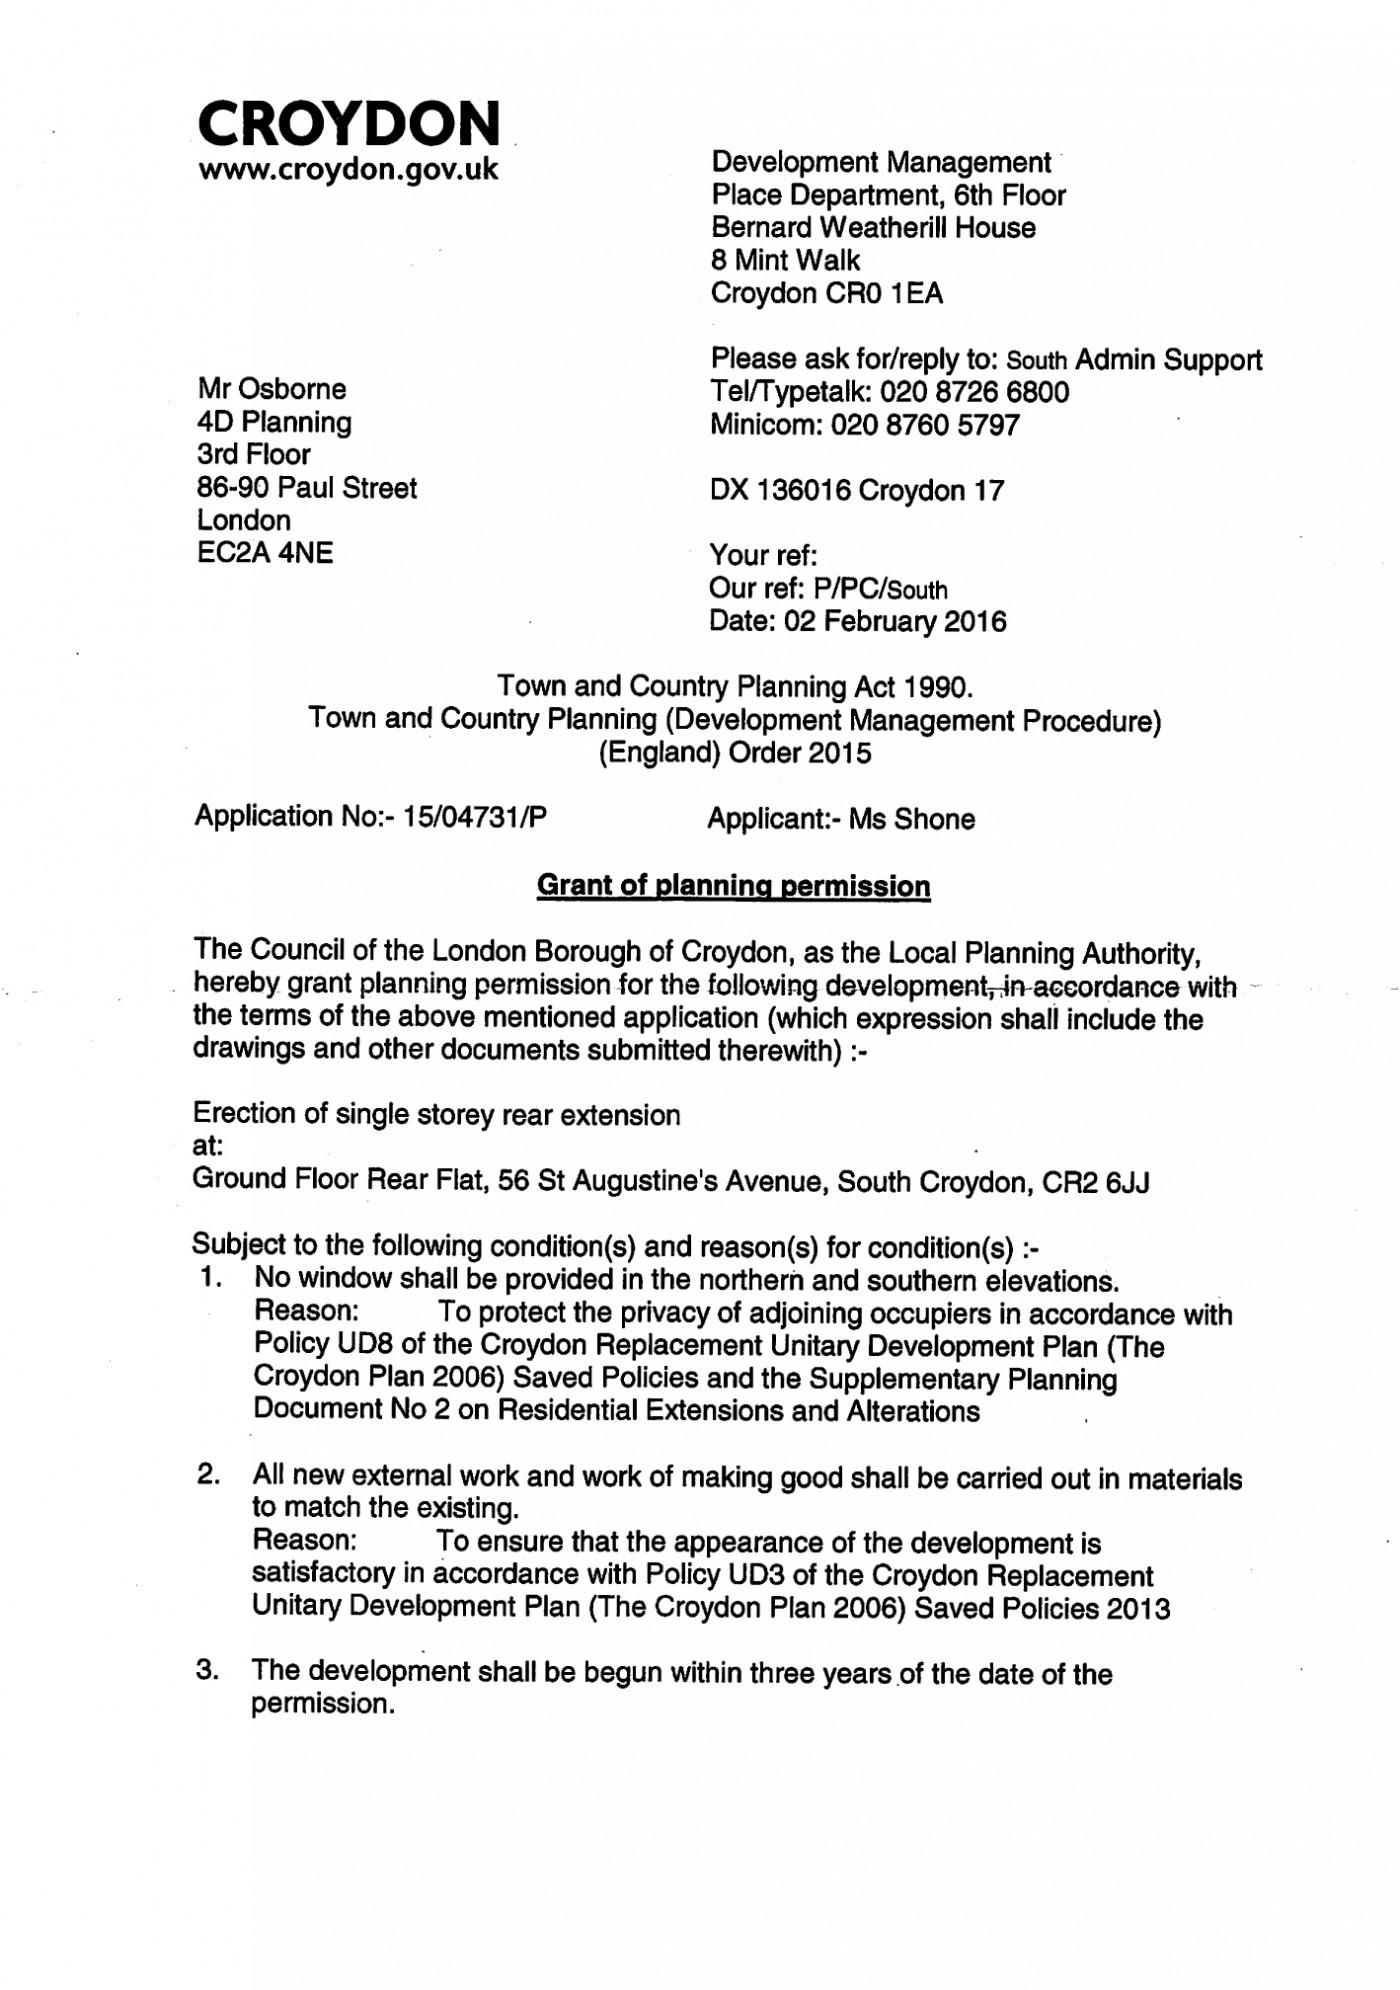 decision notice - Croydon